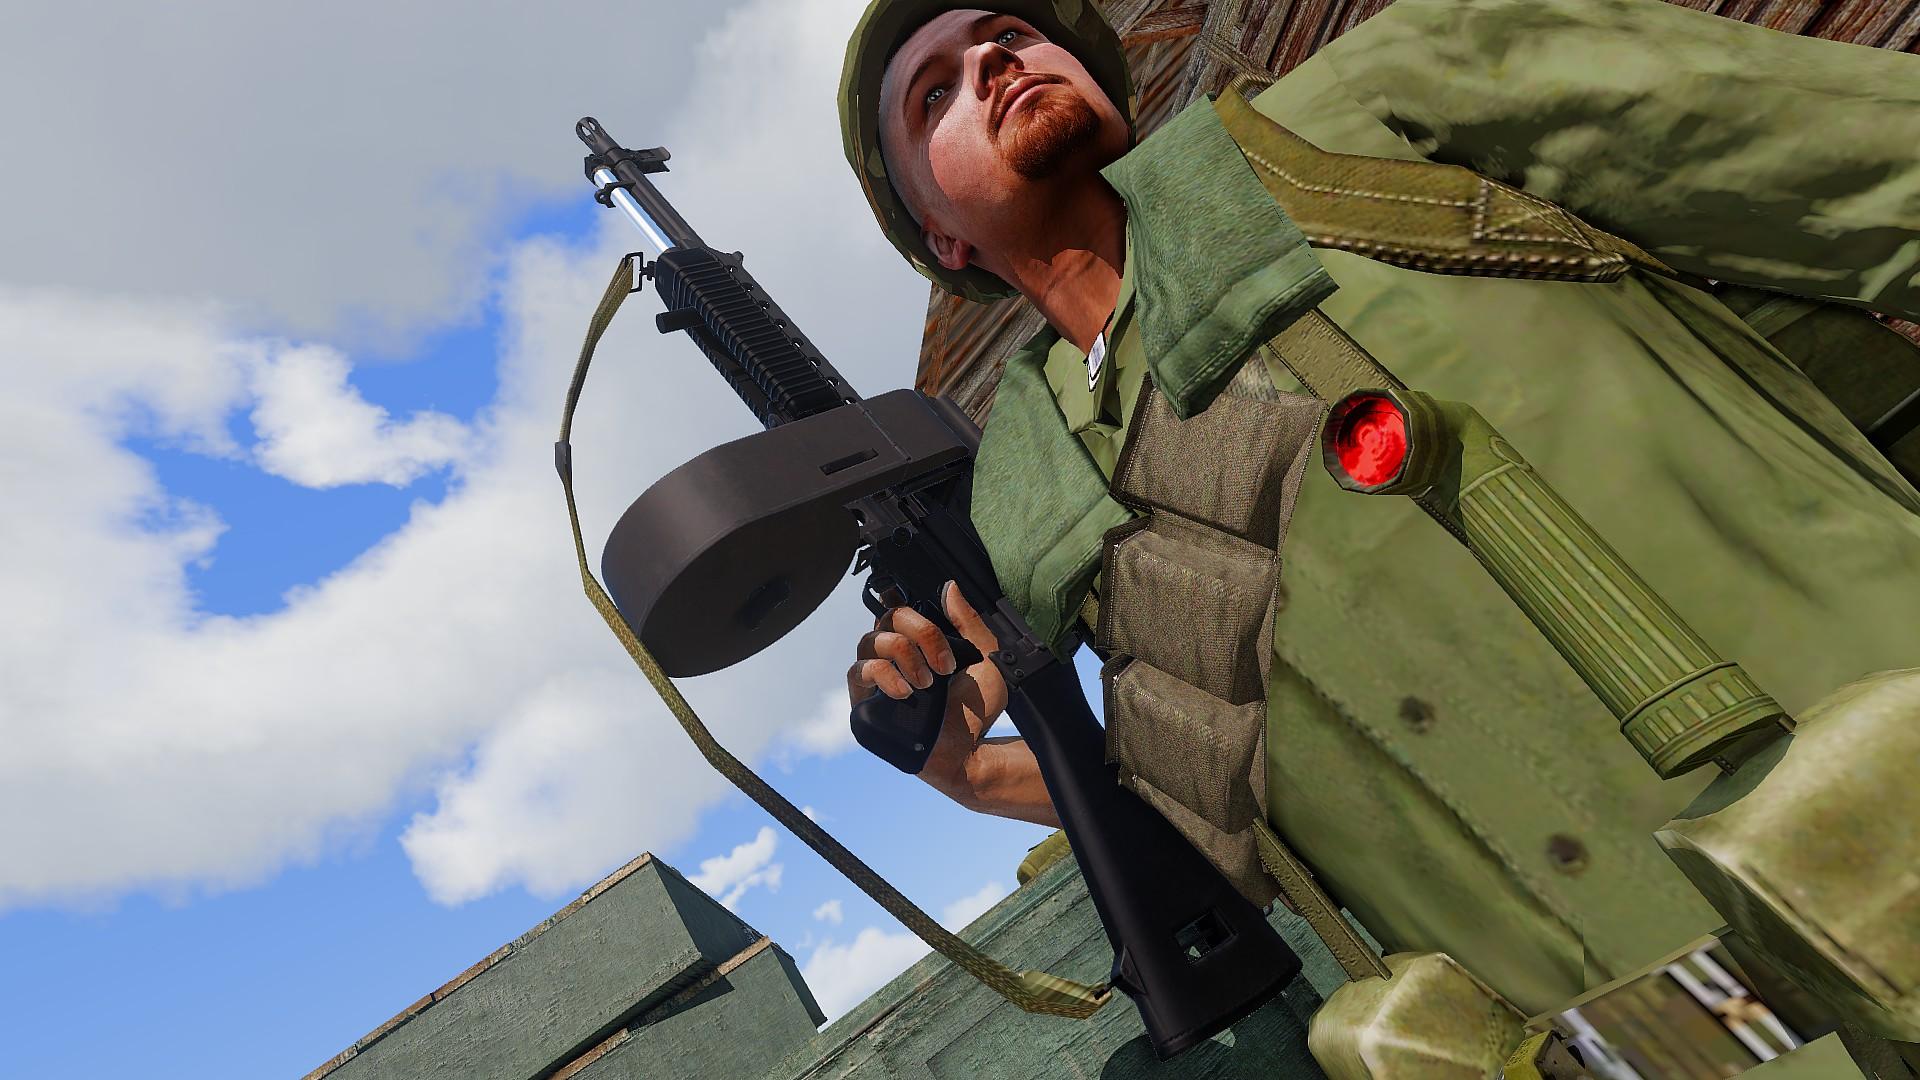 Vietnam Unsung for ArmA 3